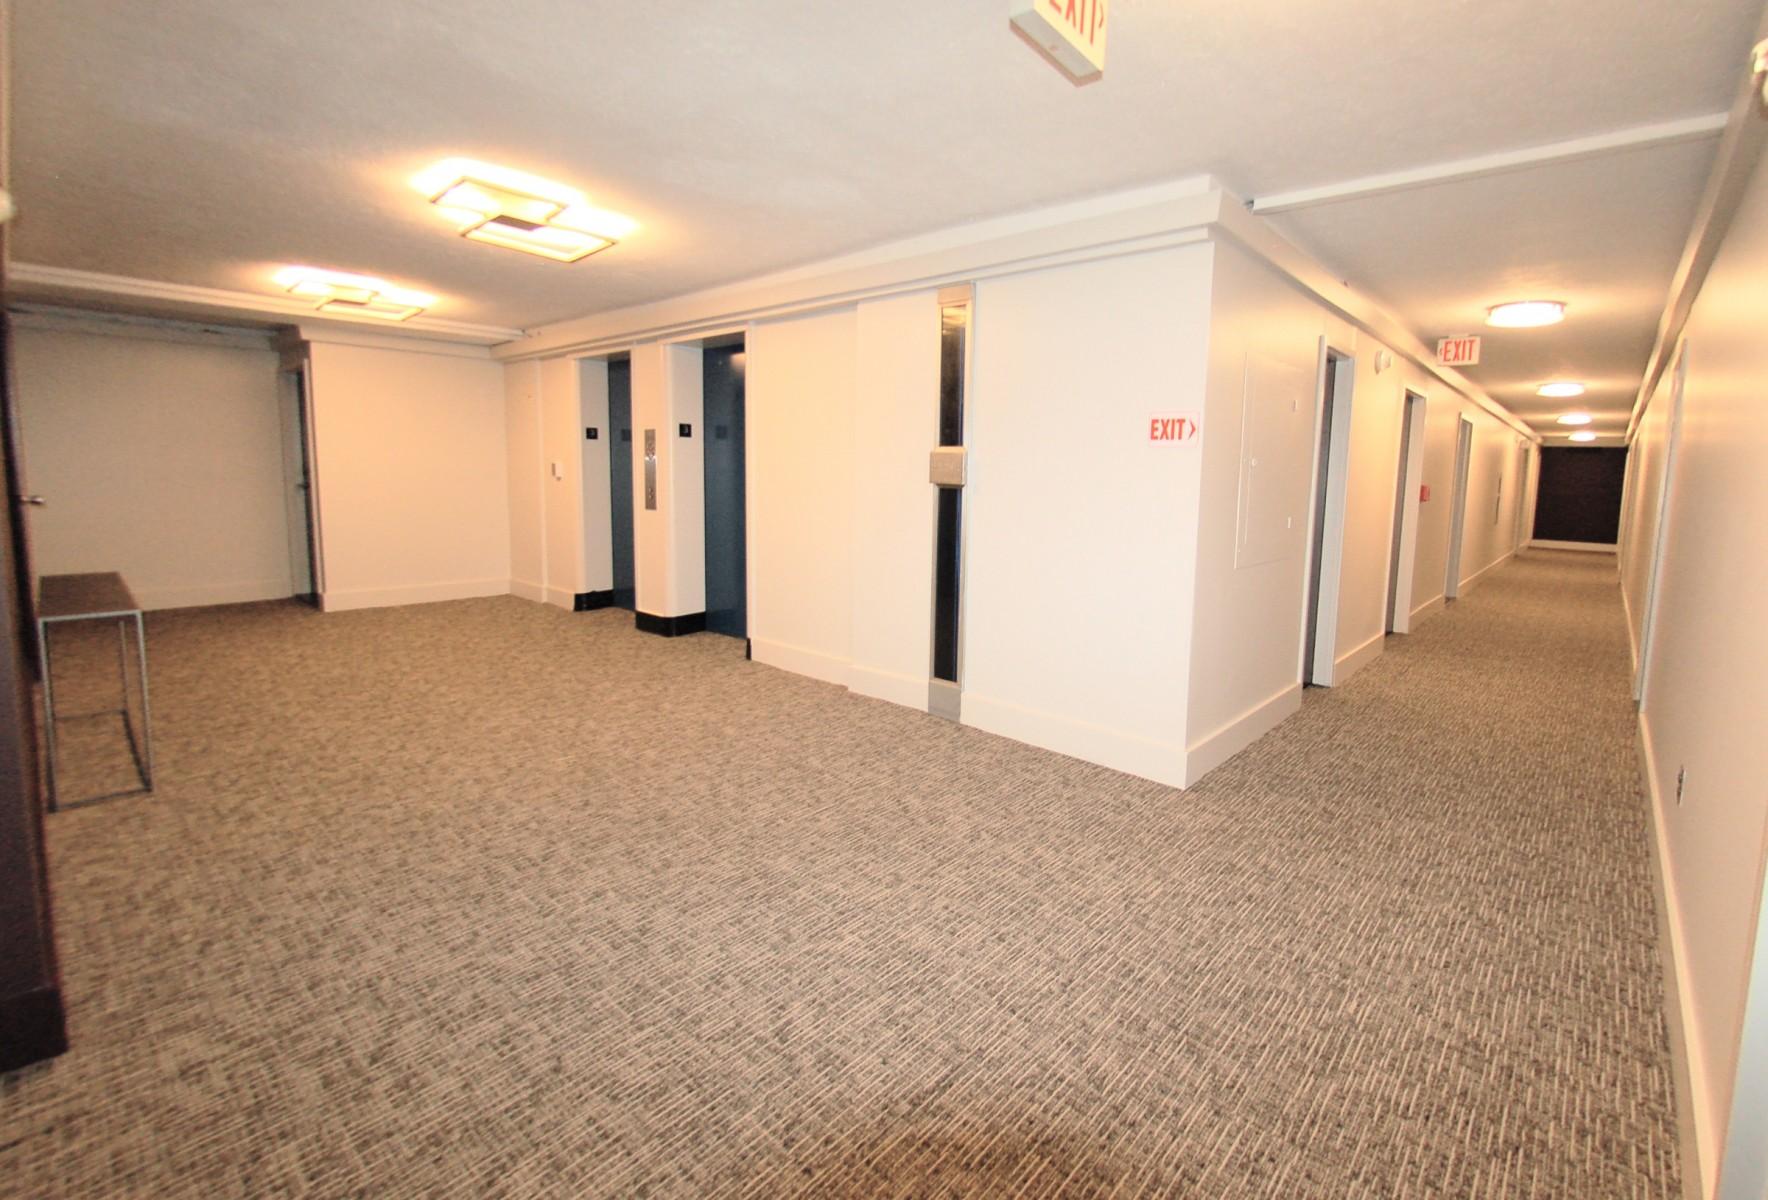 1440NStNW311-10-Hall